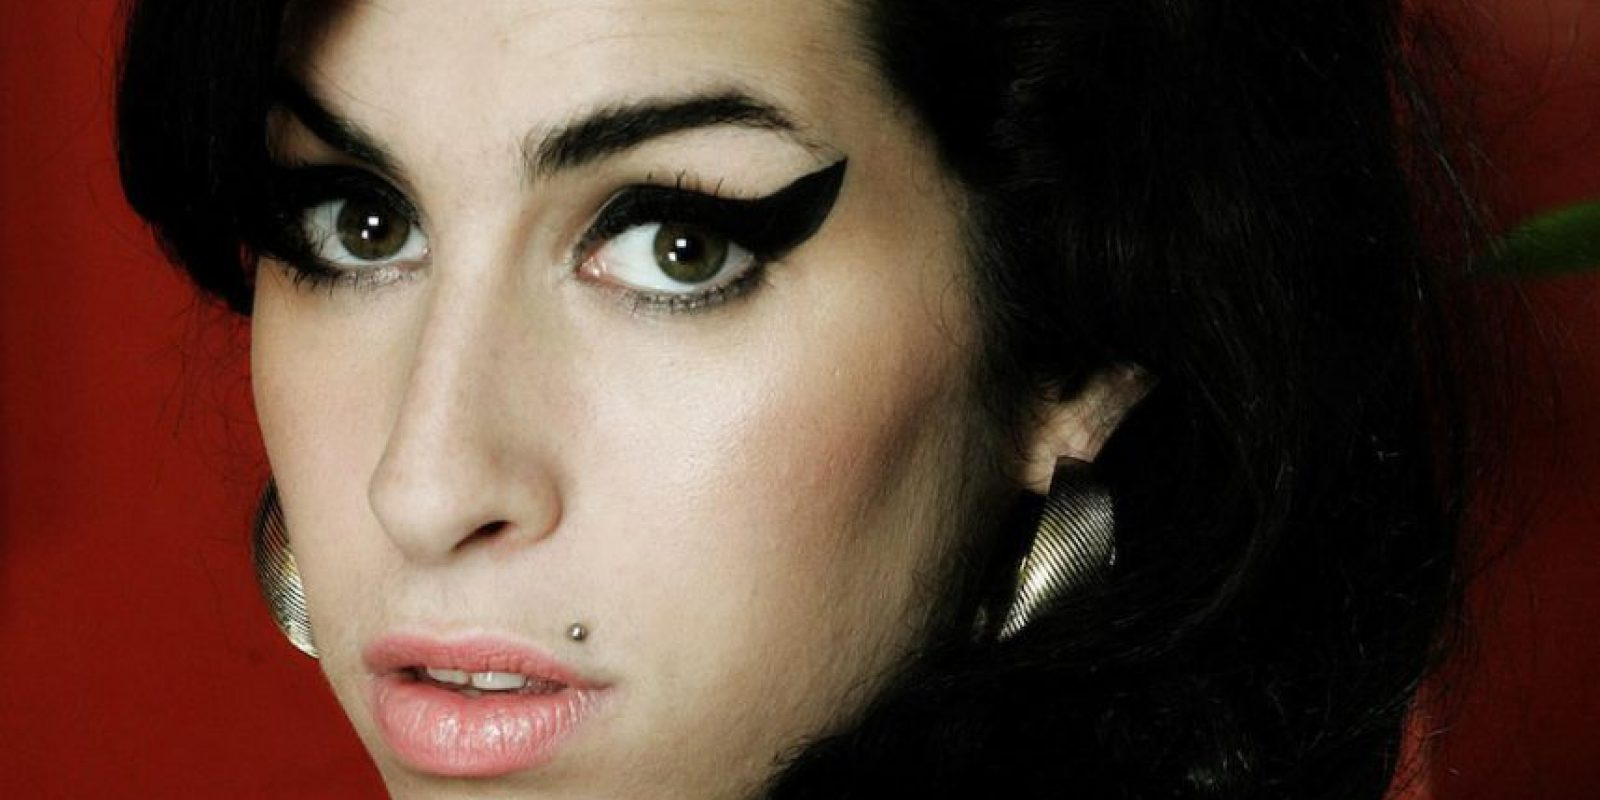 Narra la historia de la cantante británica fallecida en 2011. Foto:Netflix